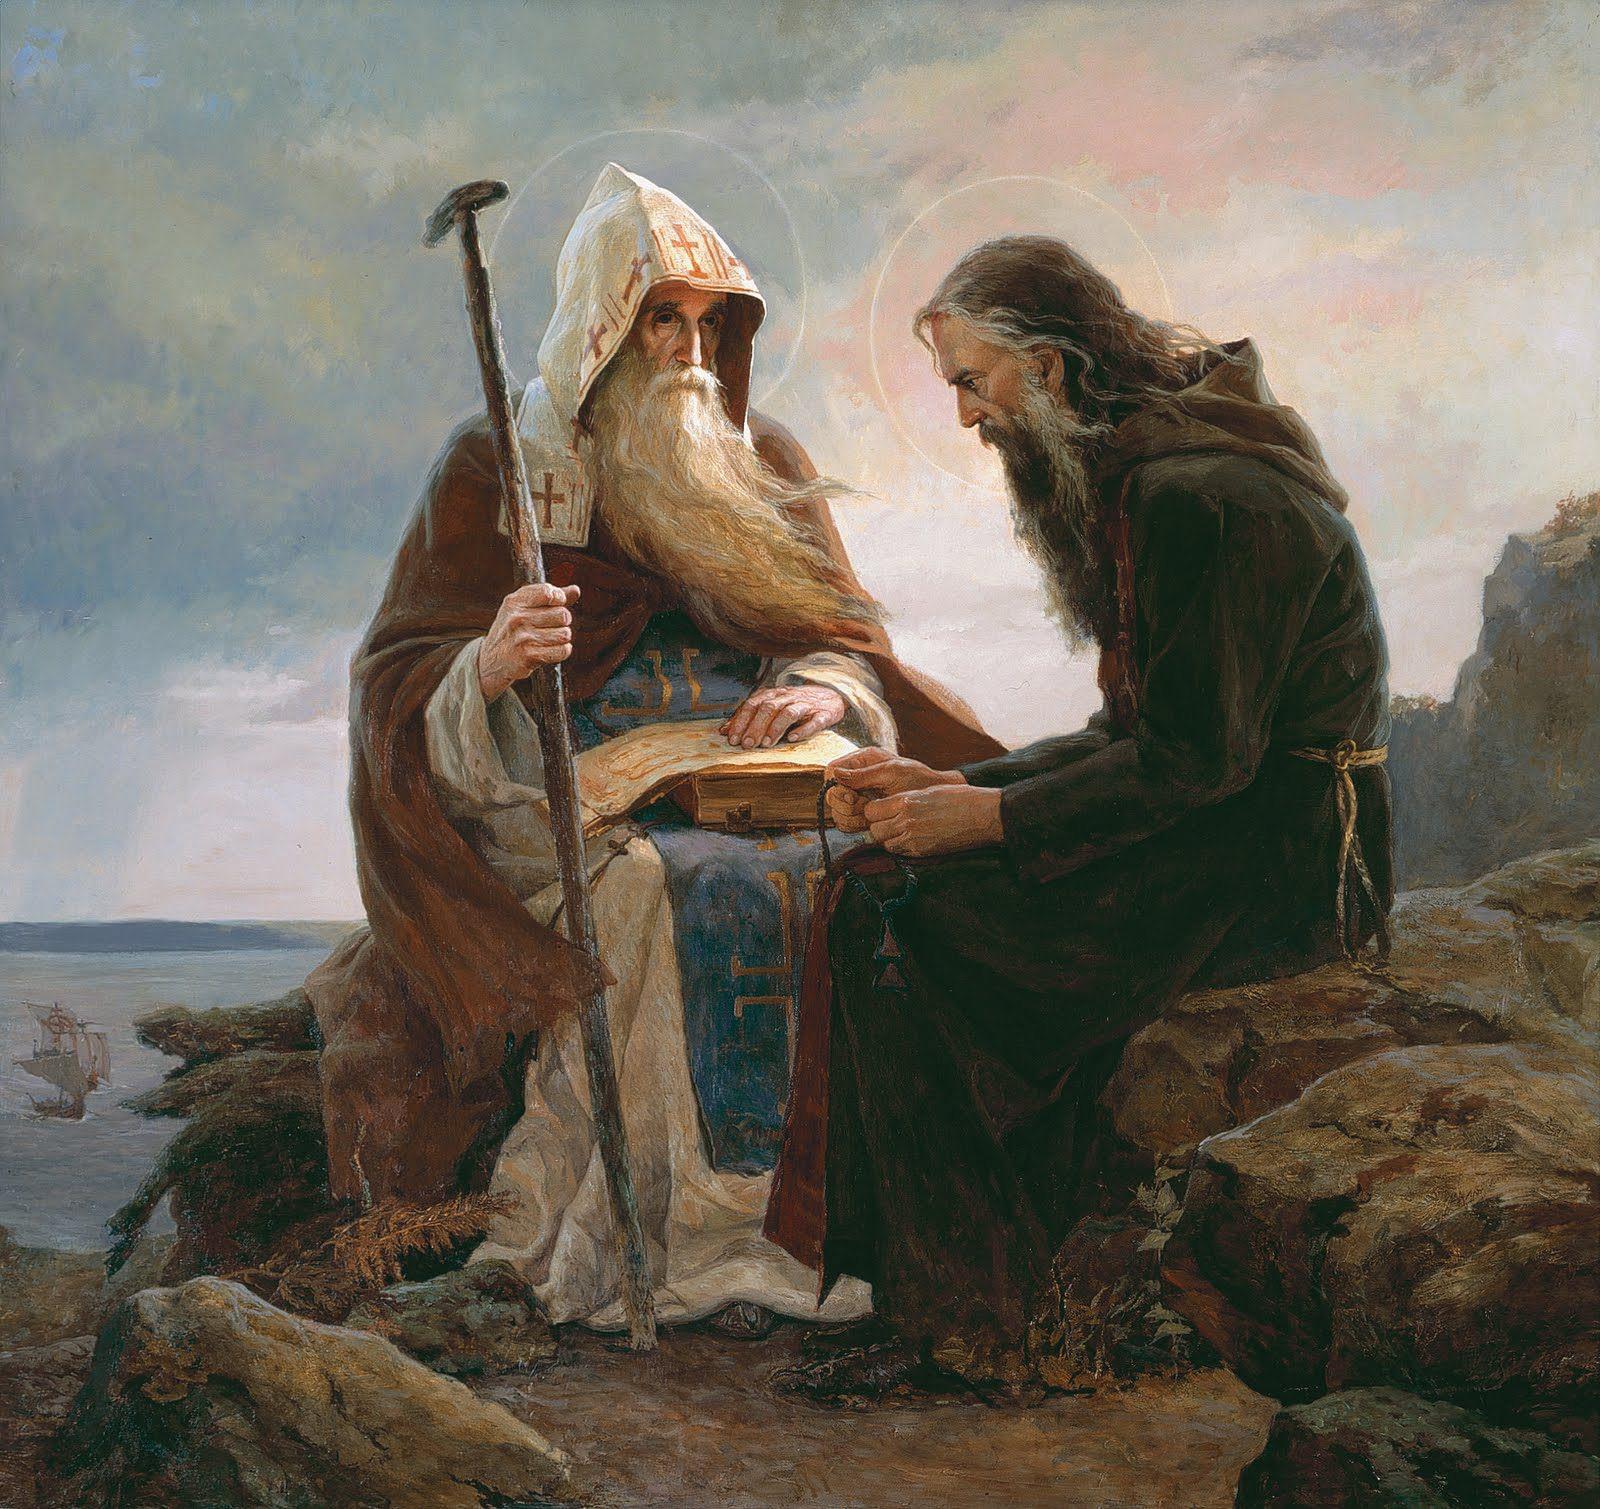 Jeff Cavins – Sharing the Good News